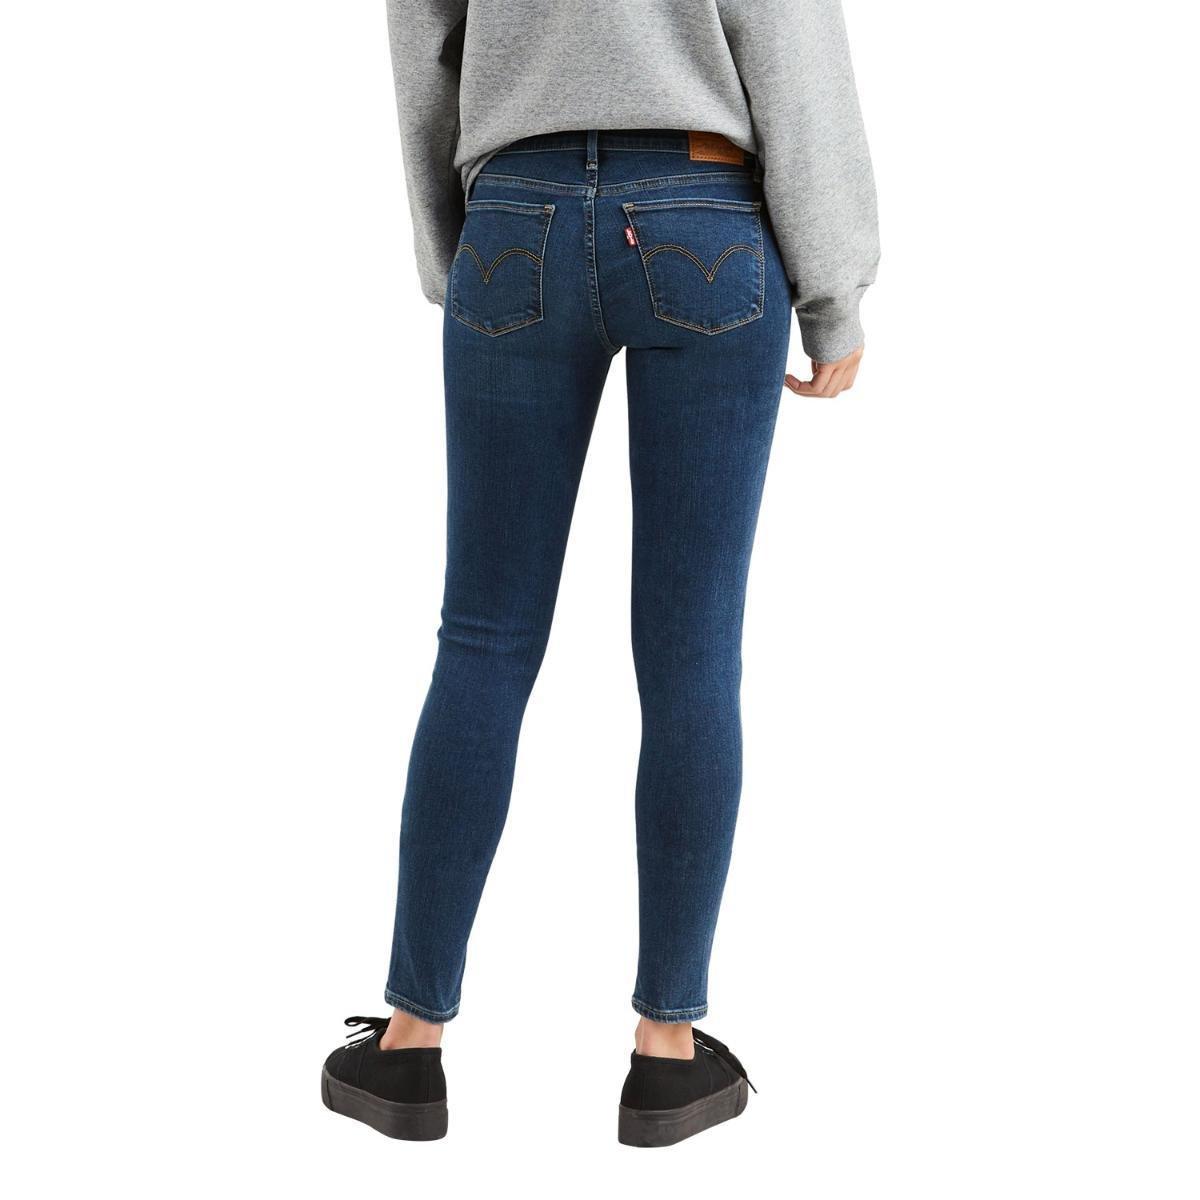 Calça Jeans Levis 710 Super Skinny Innovation Feminina - Compre ... 99b7f80f531